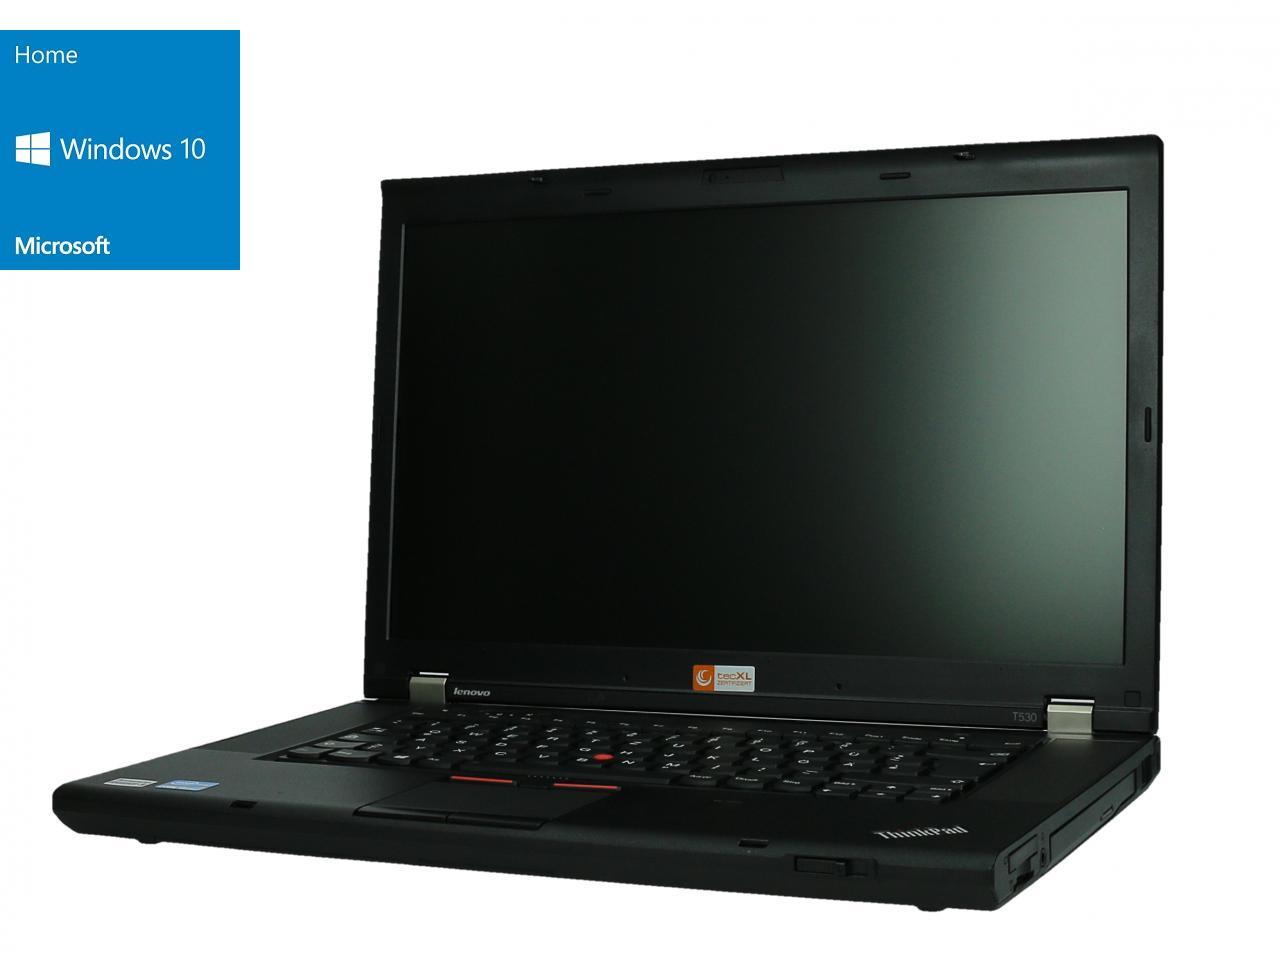 Lenovo ThinkPad T530  - shop.bb-net.de